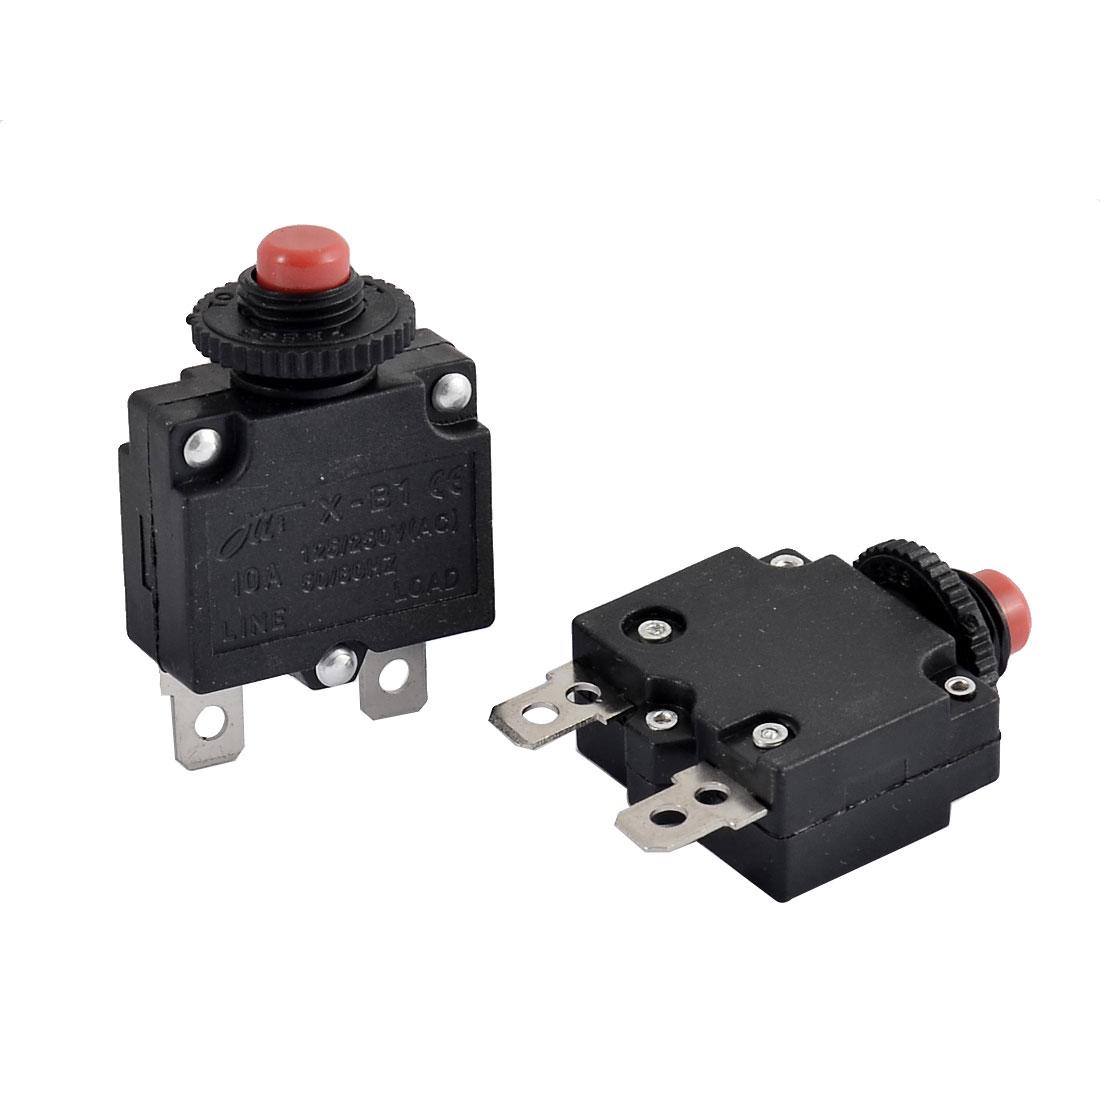 Air Compressor 10A Circuit Breaker Current Overload Protector Switch 2pcs